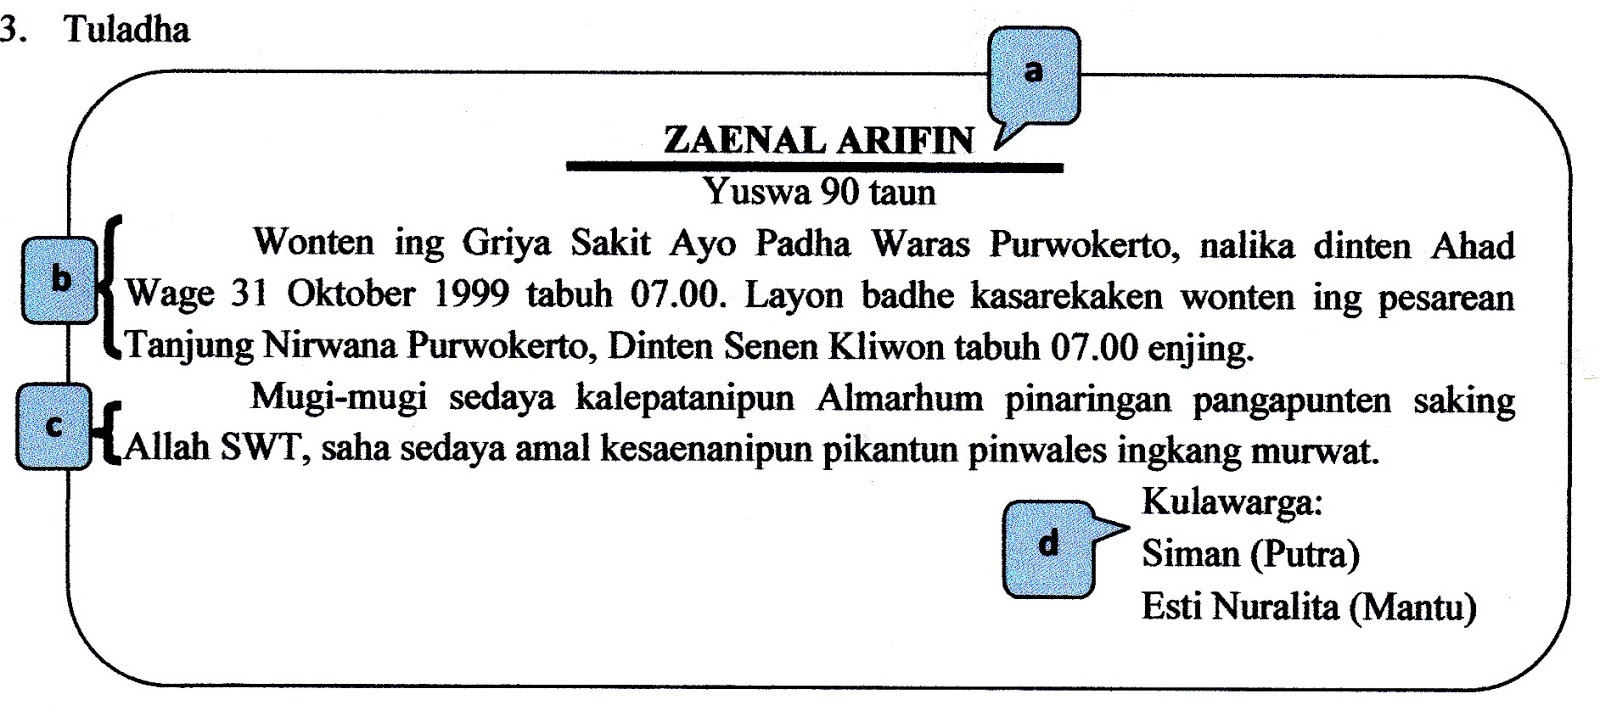 Tuladha Wacana Basa Jawa Wacana Bahasa Jawa Welcome To My Orec Orec Contoh Tuladha Wacana Bahasa Jawa Naskahkutk